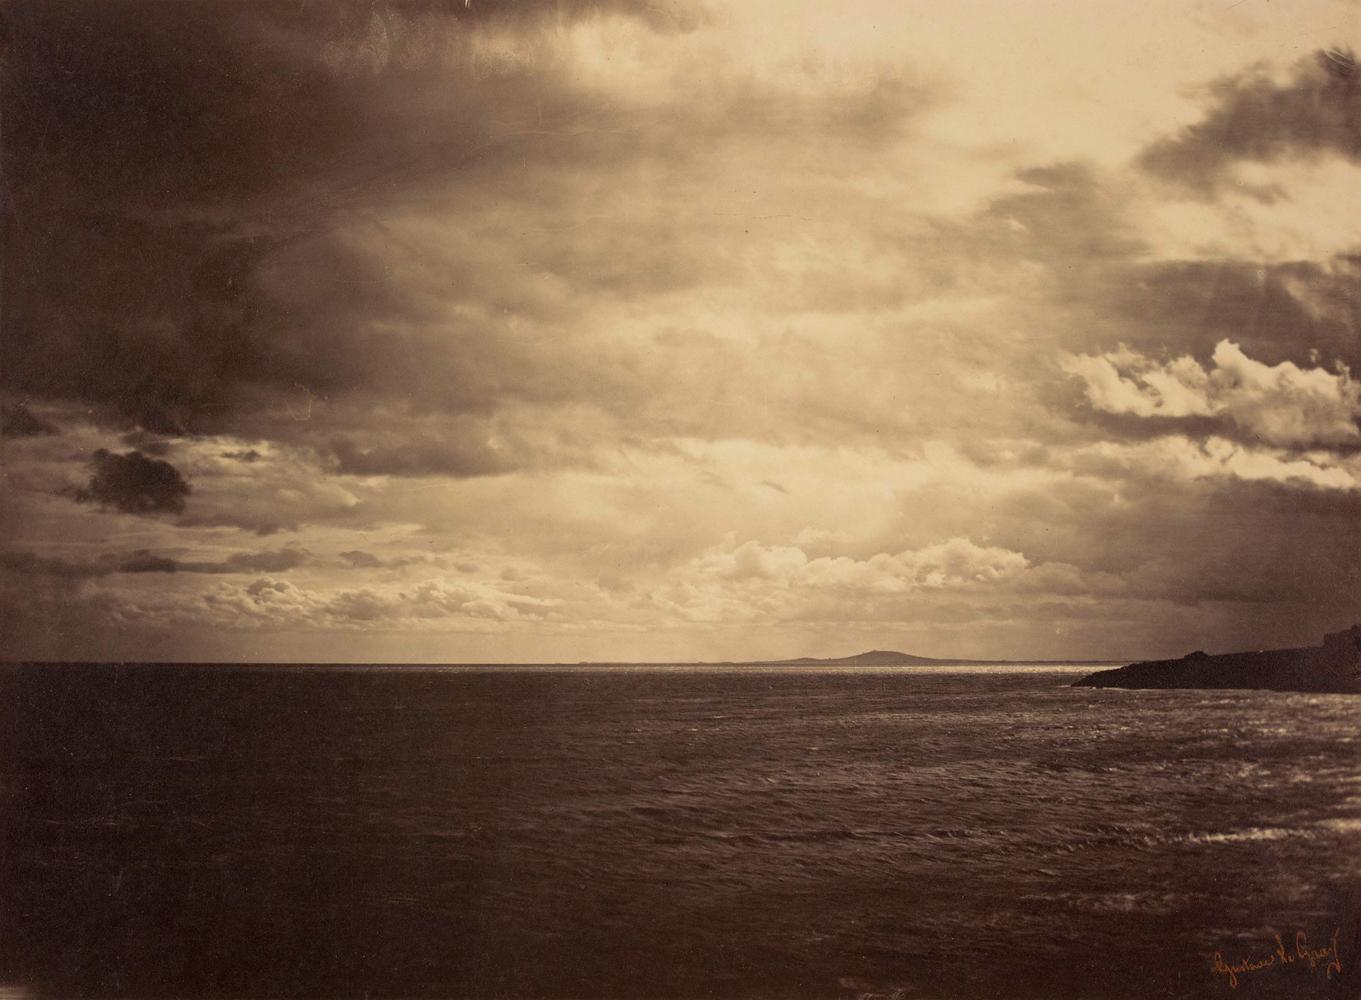 Cloudy Sky - Mediterranean Sea, 1857